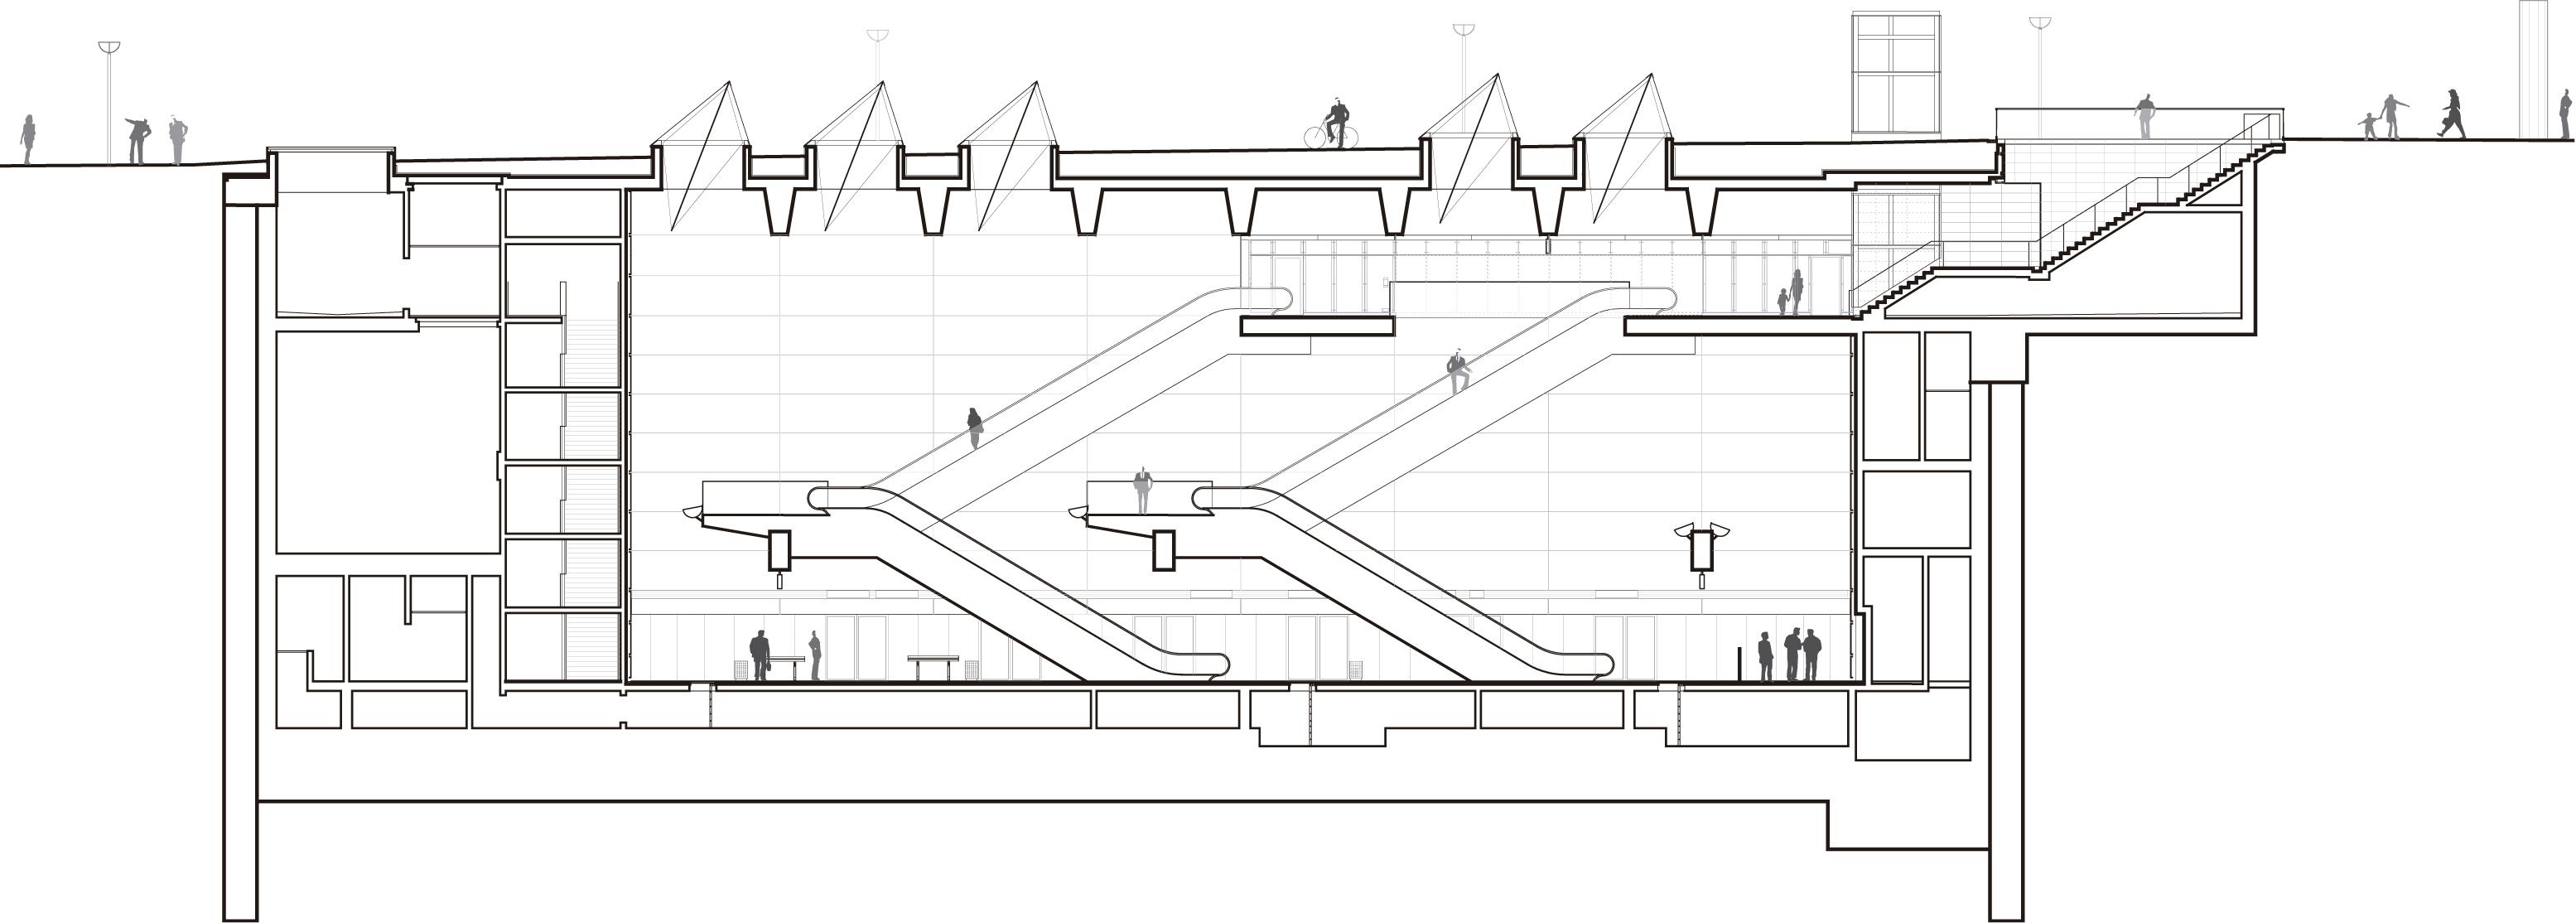 Metro Section